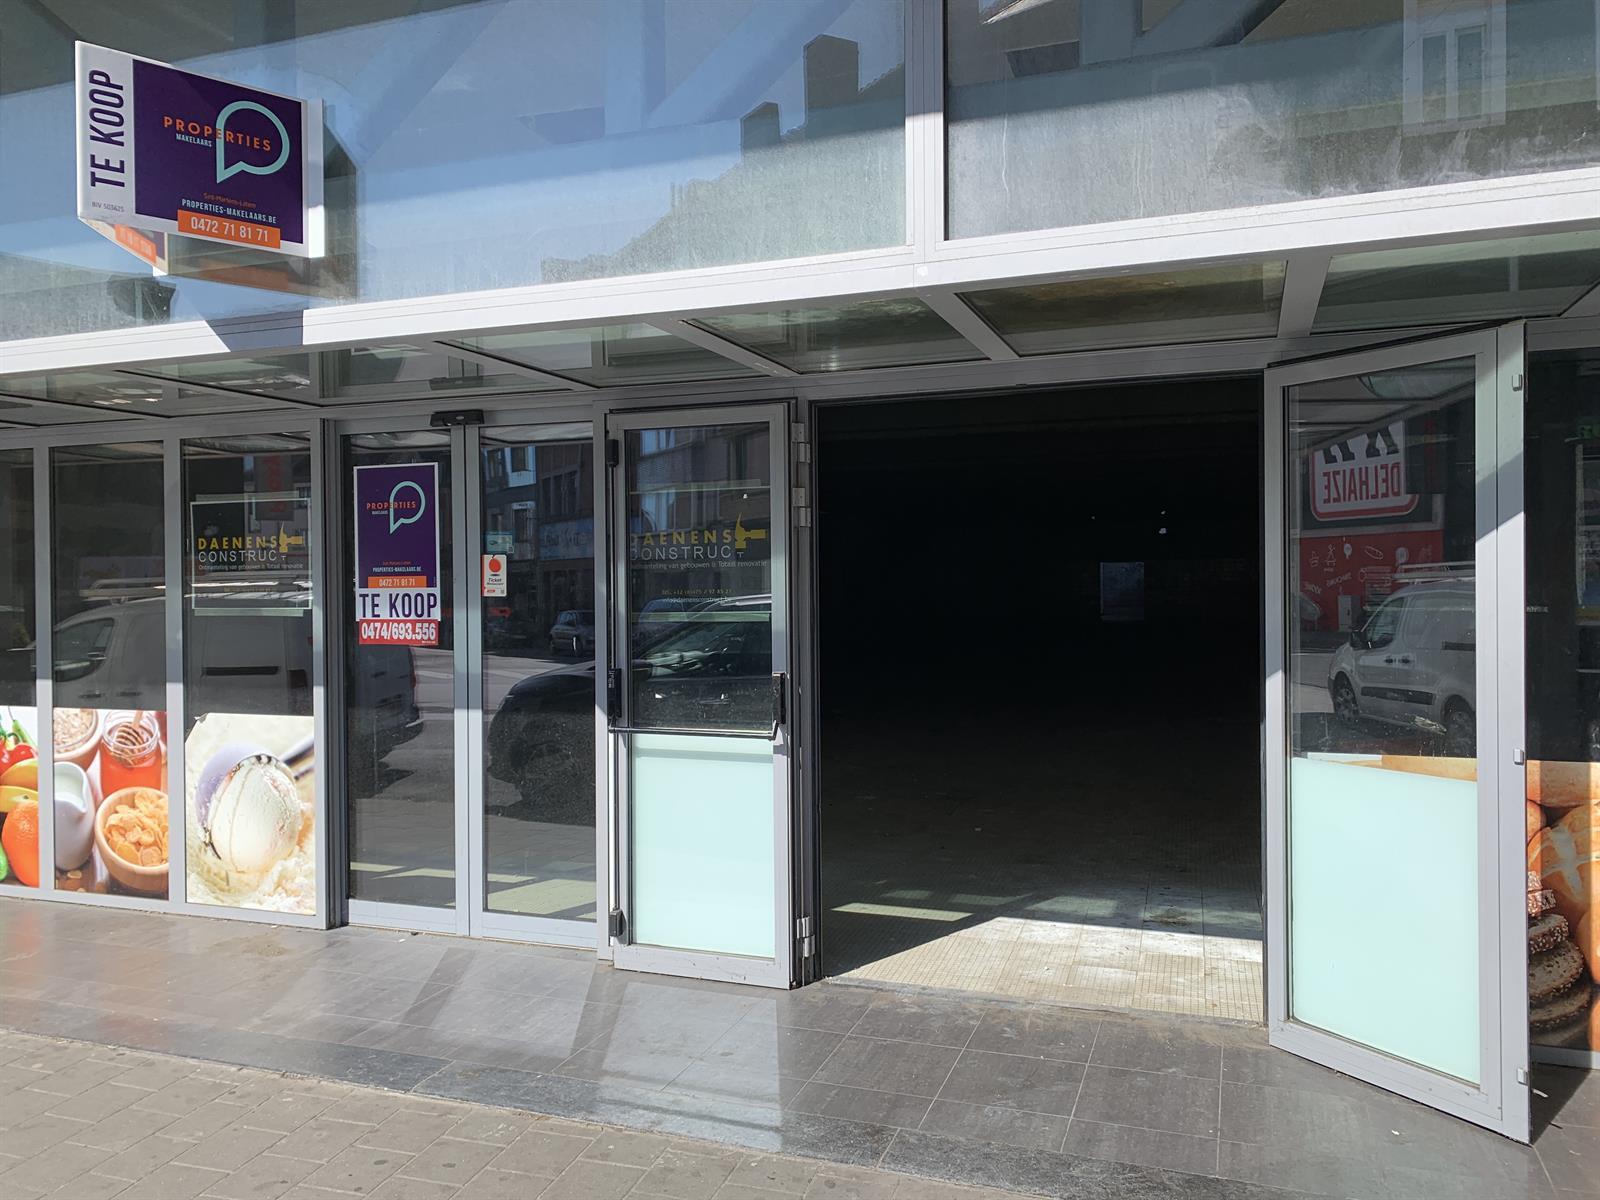 Casco winkelpand Gent Centrum!